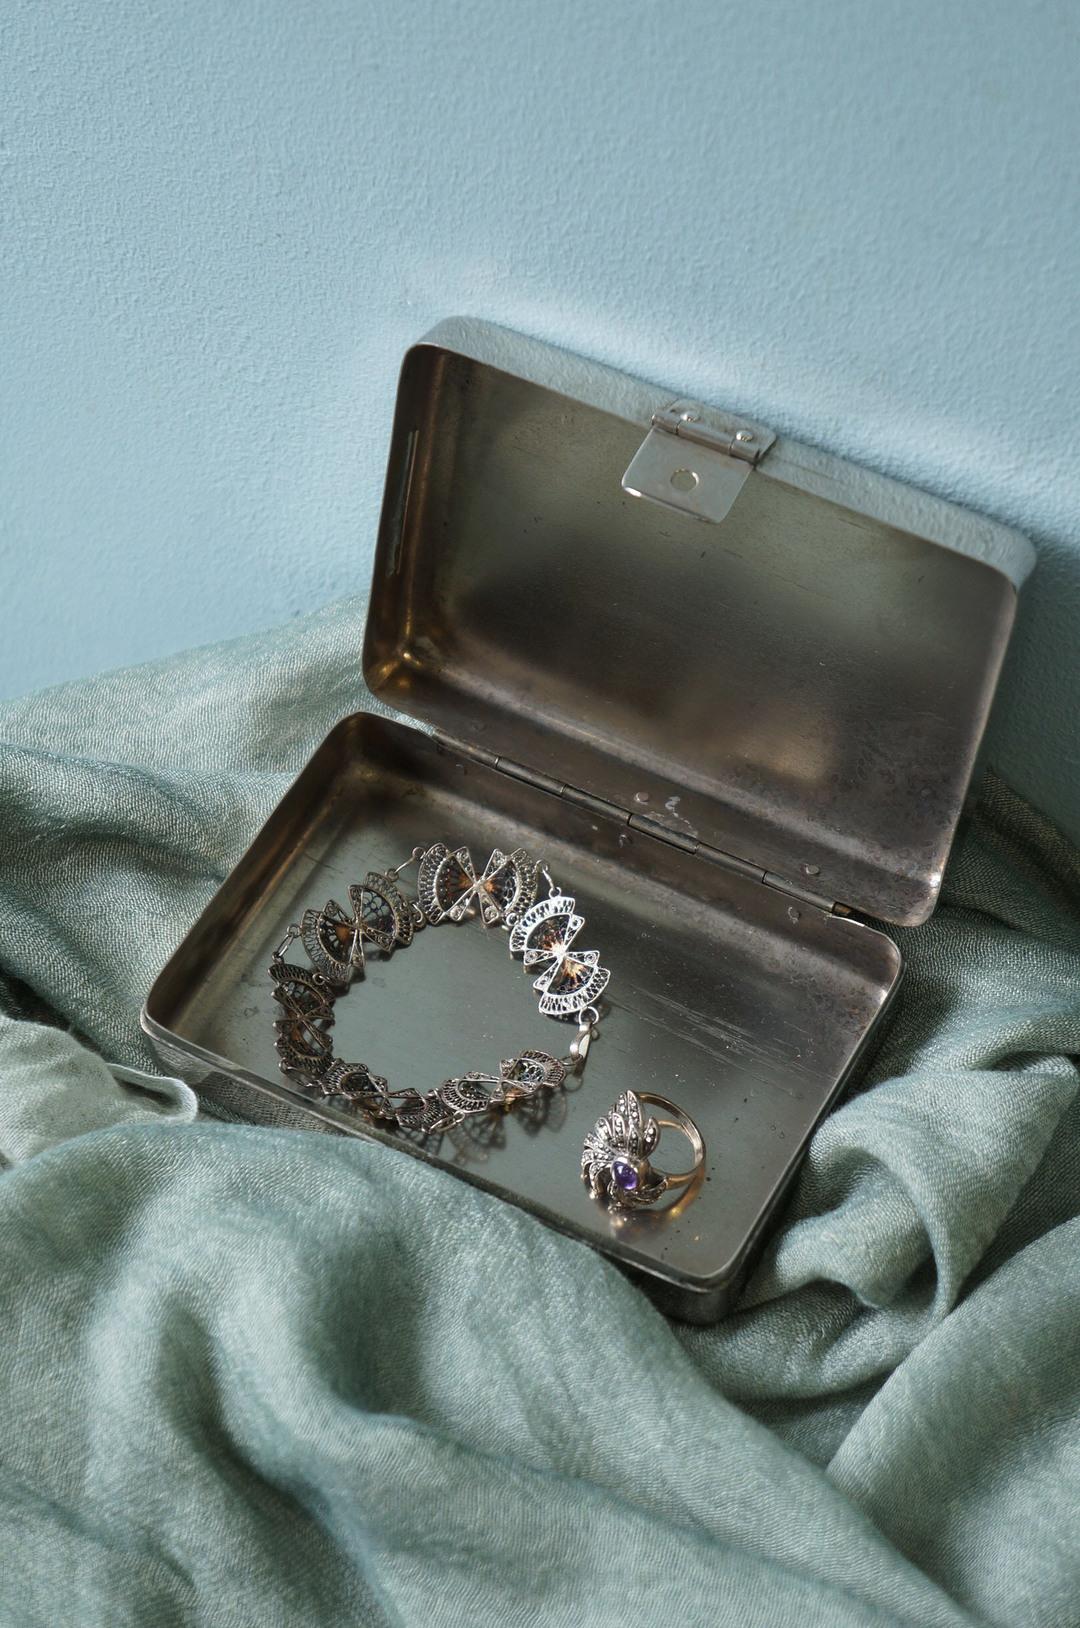 Vintage Stainless Interior Accessories/ヴィンテージ ステンレス トレイ ケース インテリア 小物 レトロ シャビー インダストリアル